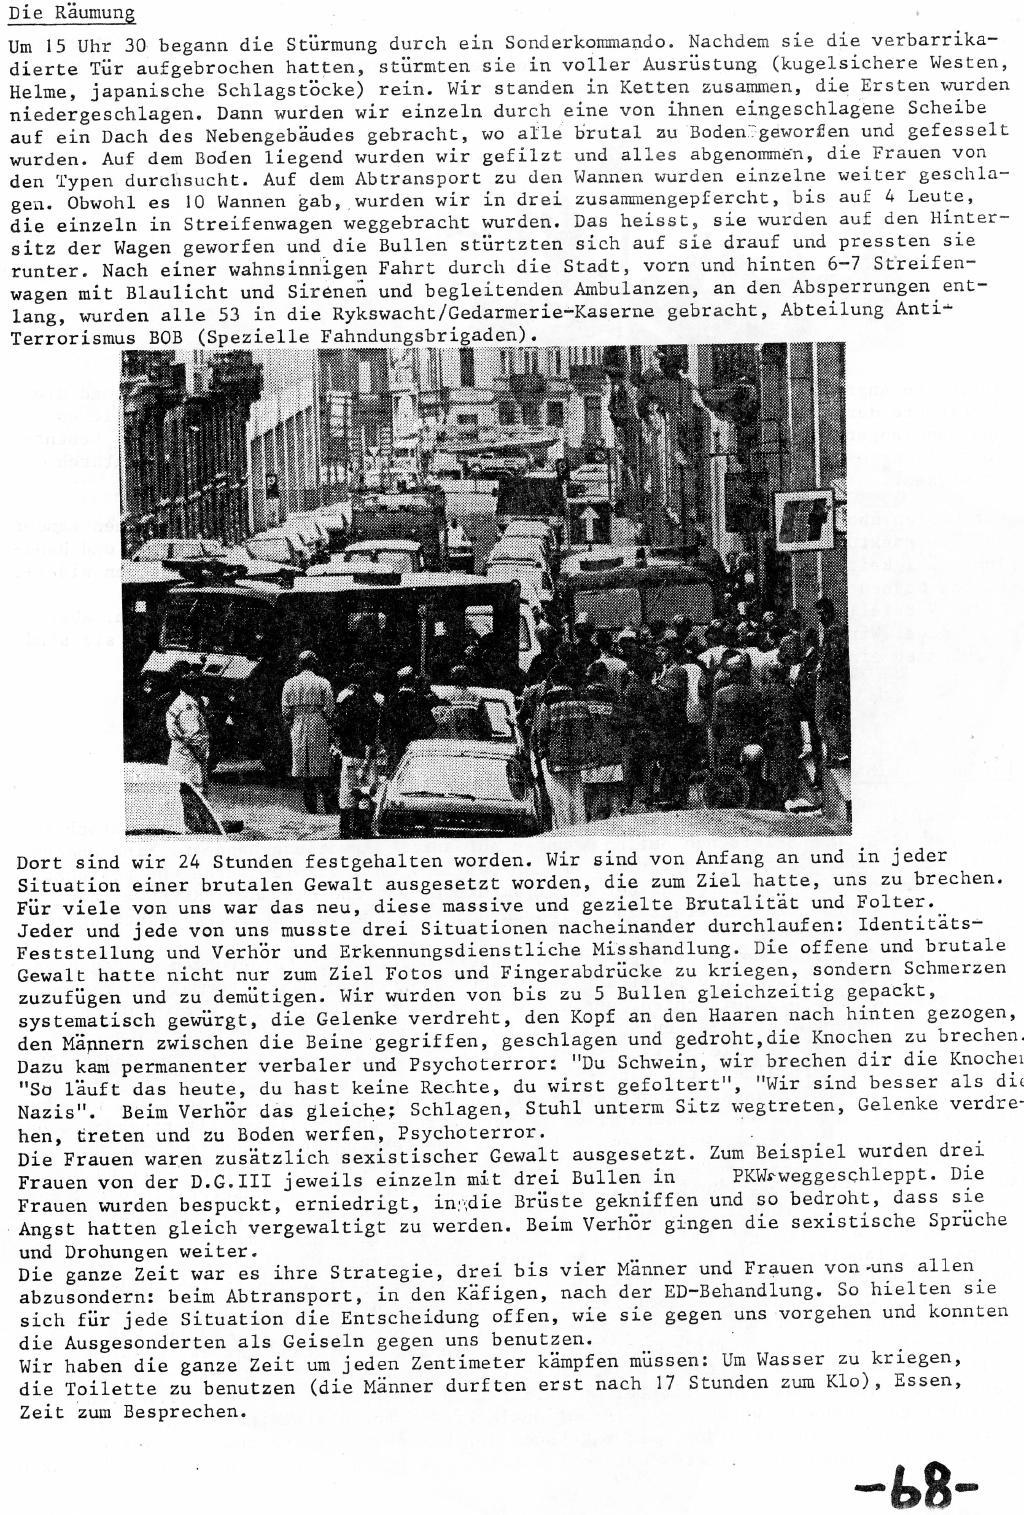 Belgien_Doku_Besetzung_EG_Kommission_1989_070